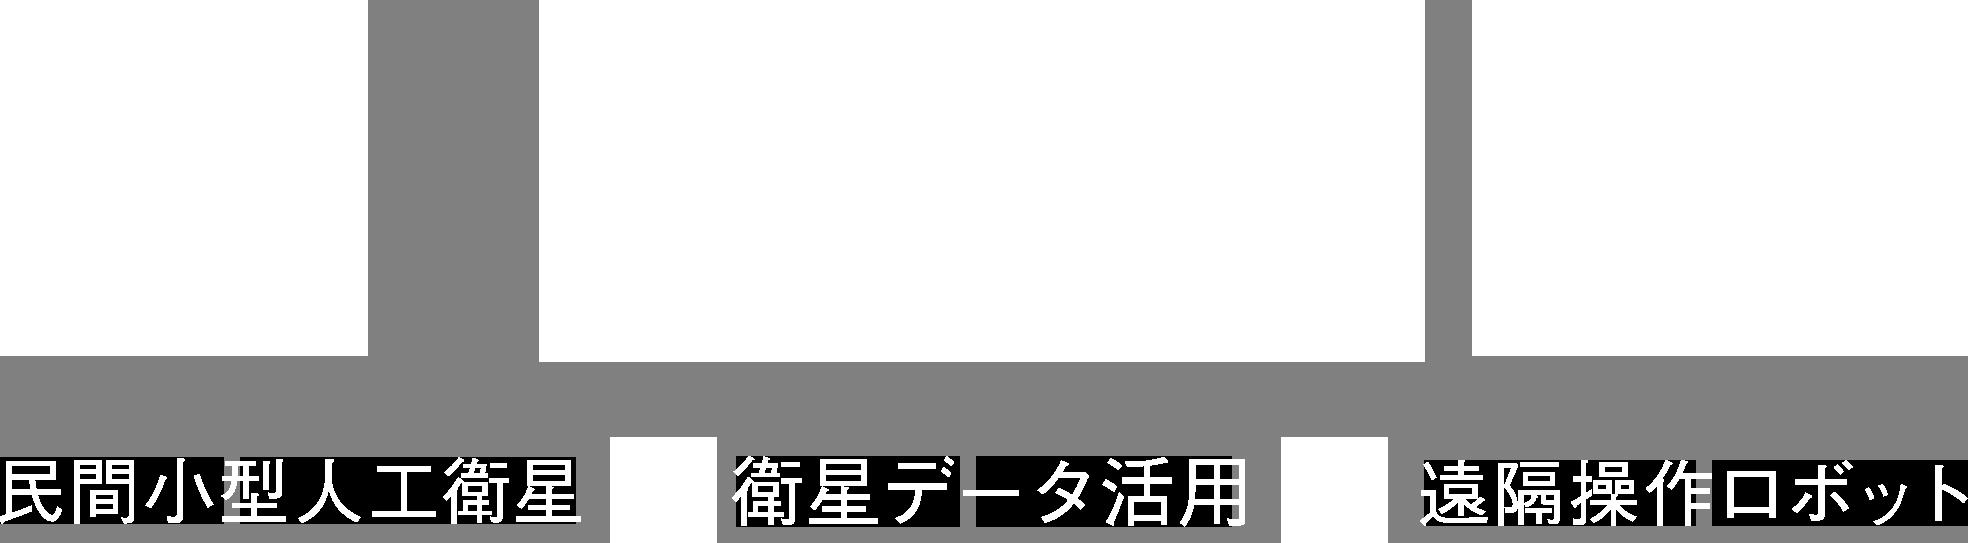 SORA ⺠間⼩型⼈⼯衛星 / 衛星データ活⽤ / 遠隔操作ロボット